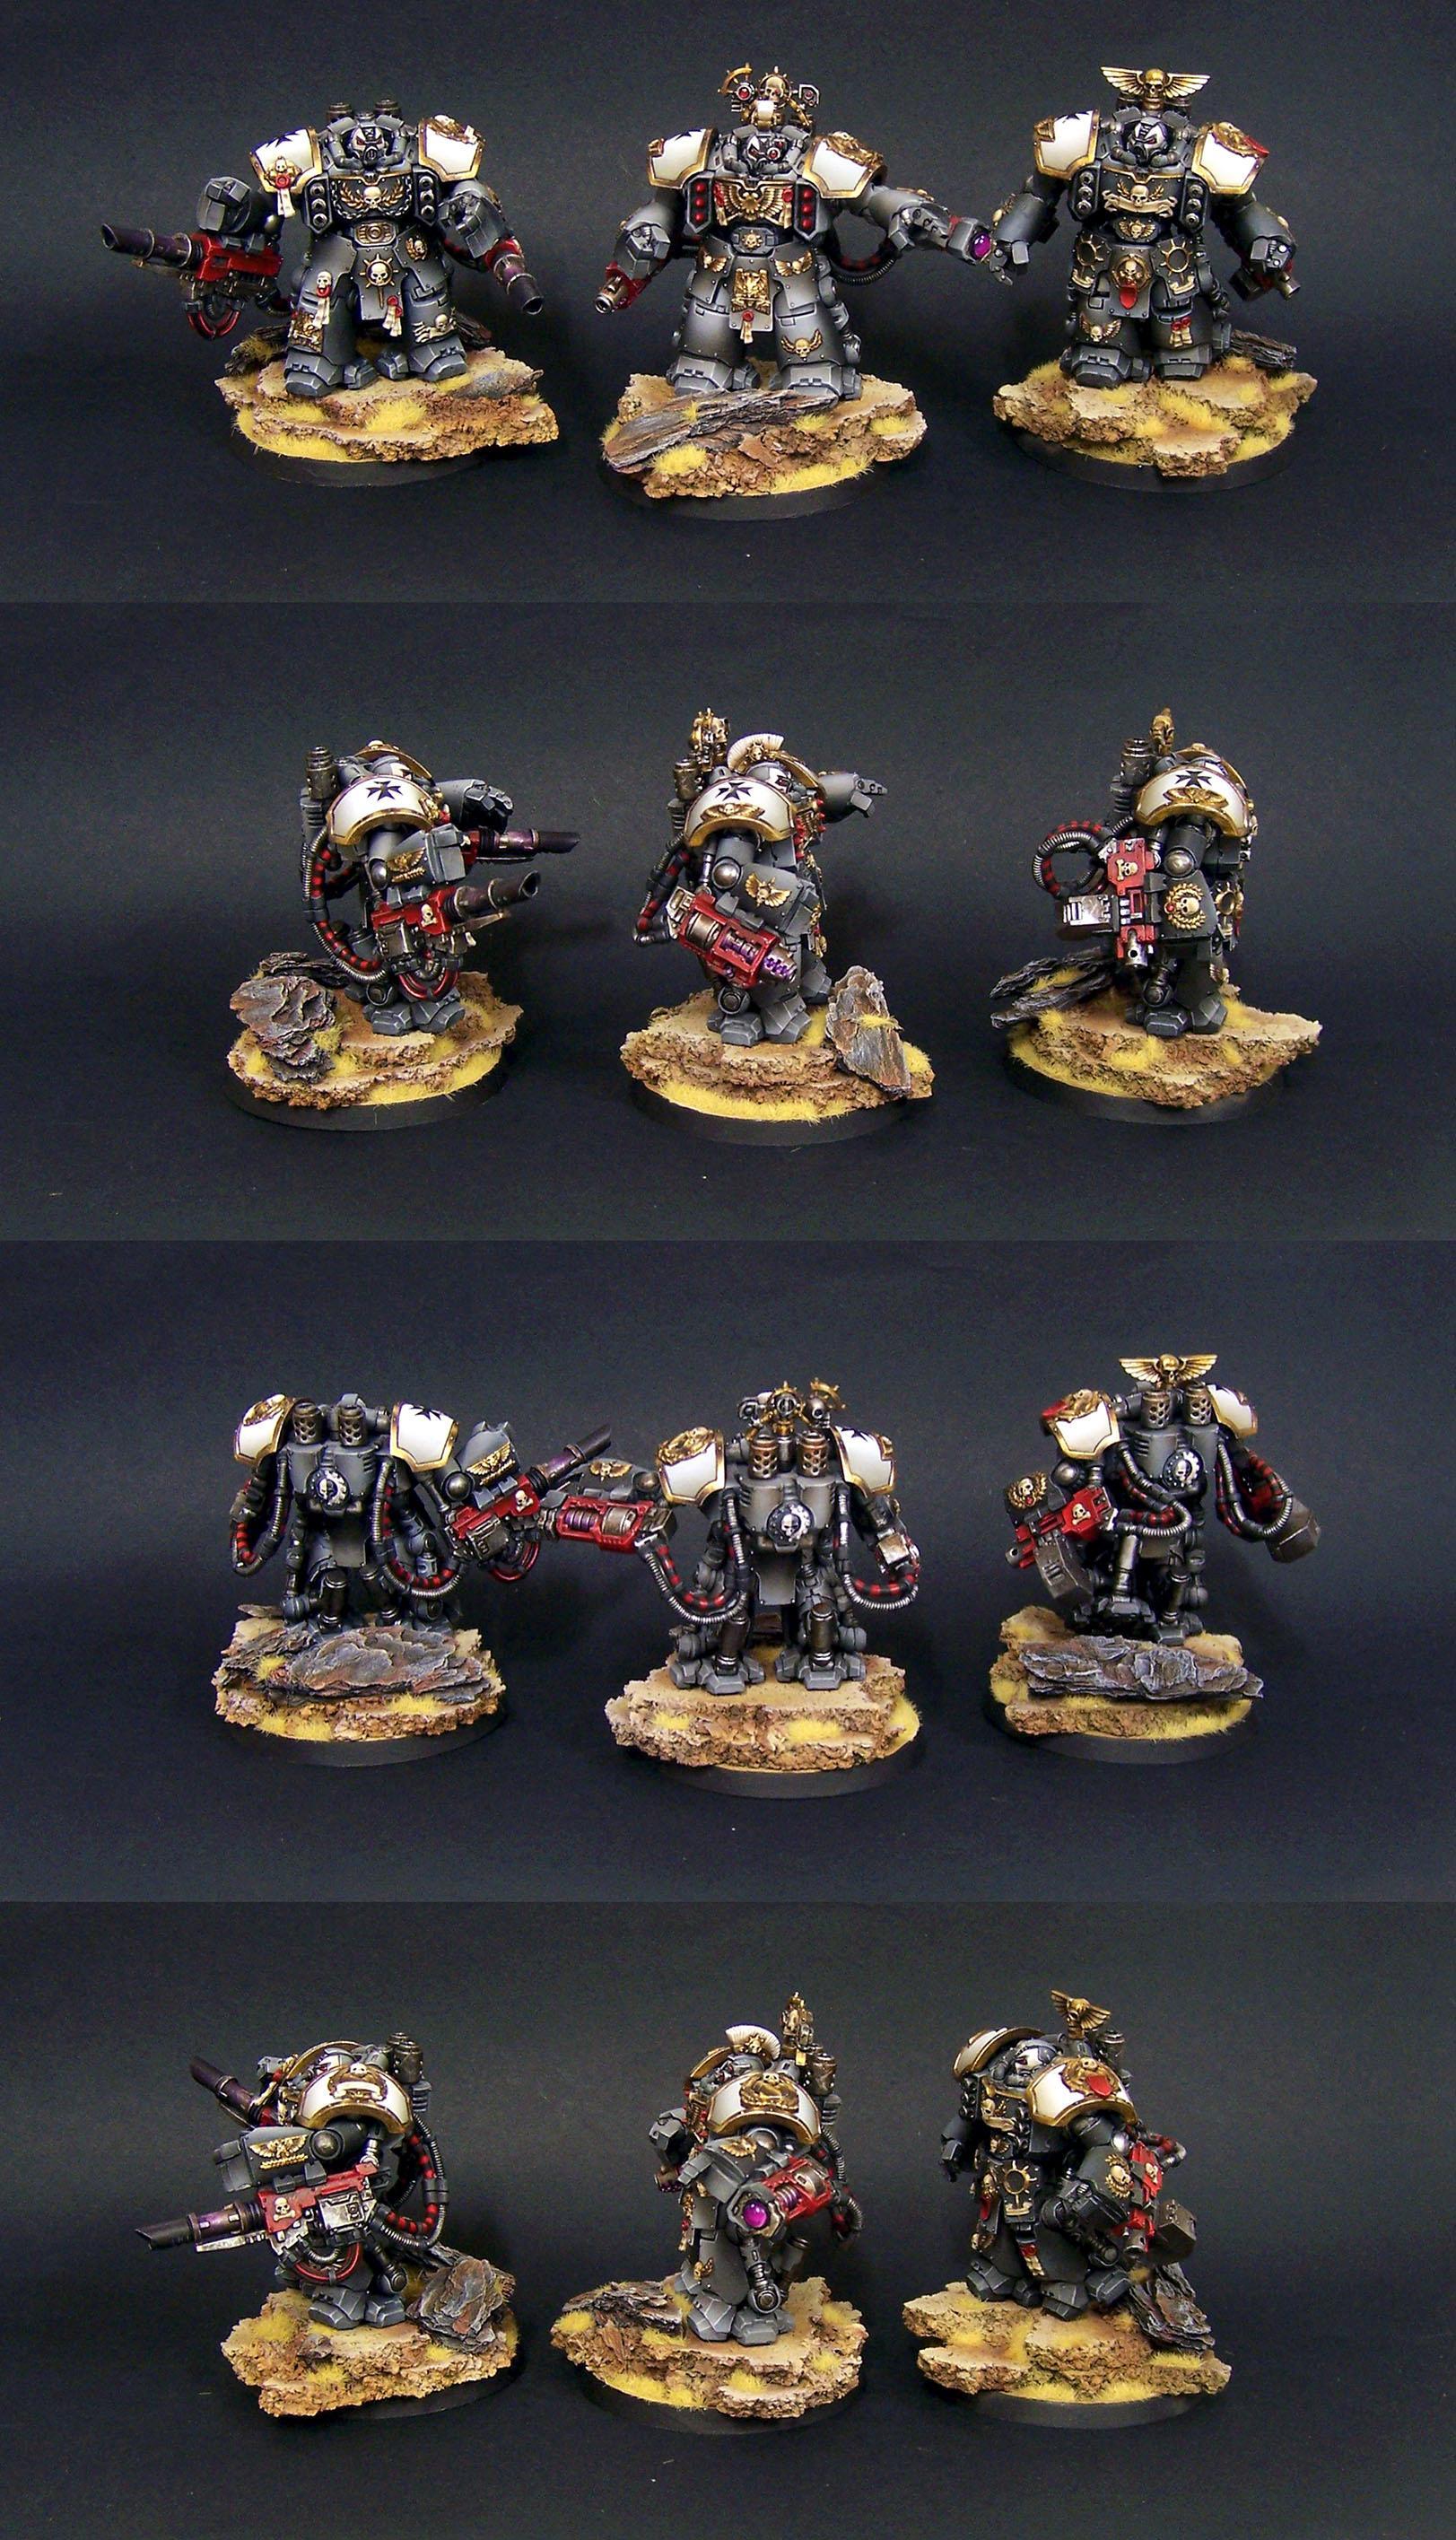 Black Templars, Centurions, Space Marines, Warhammer 40,000